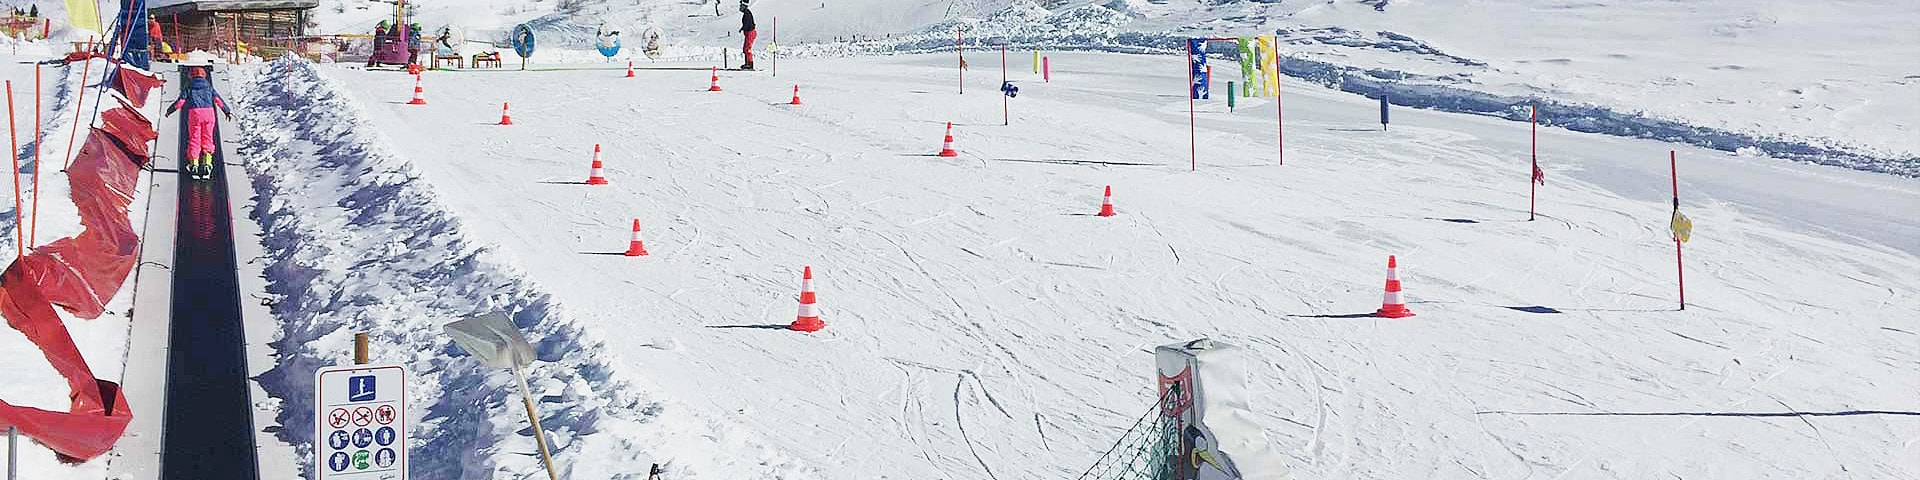 Studietur Matrei Skiskole